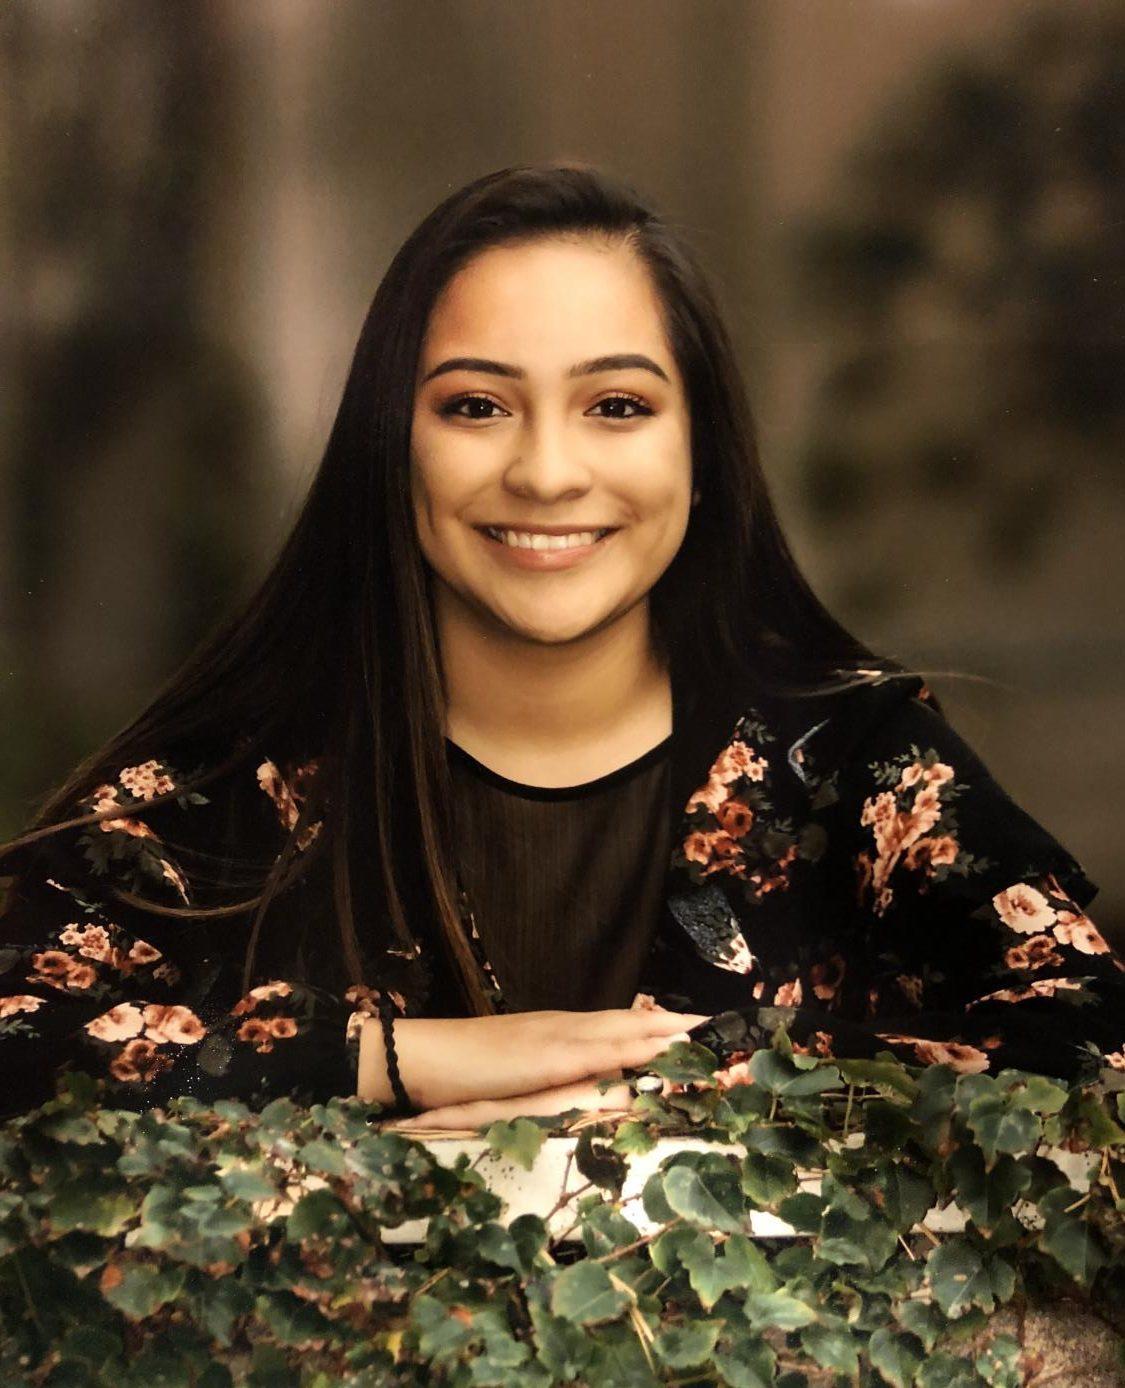 Senior Spotlight: Veronica Chavez